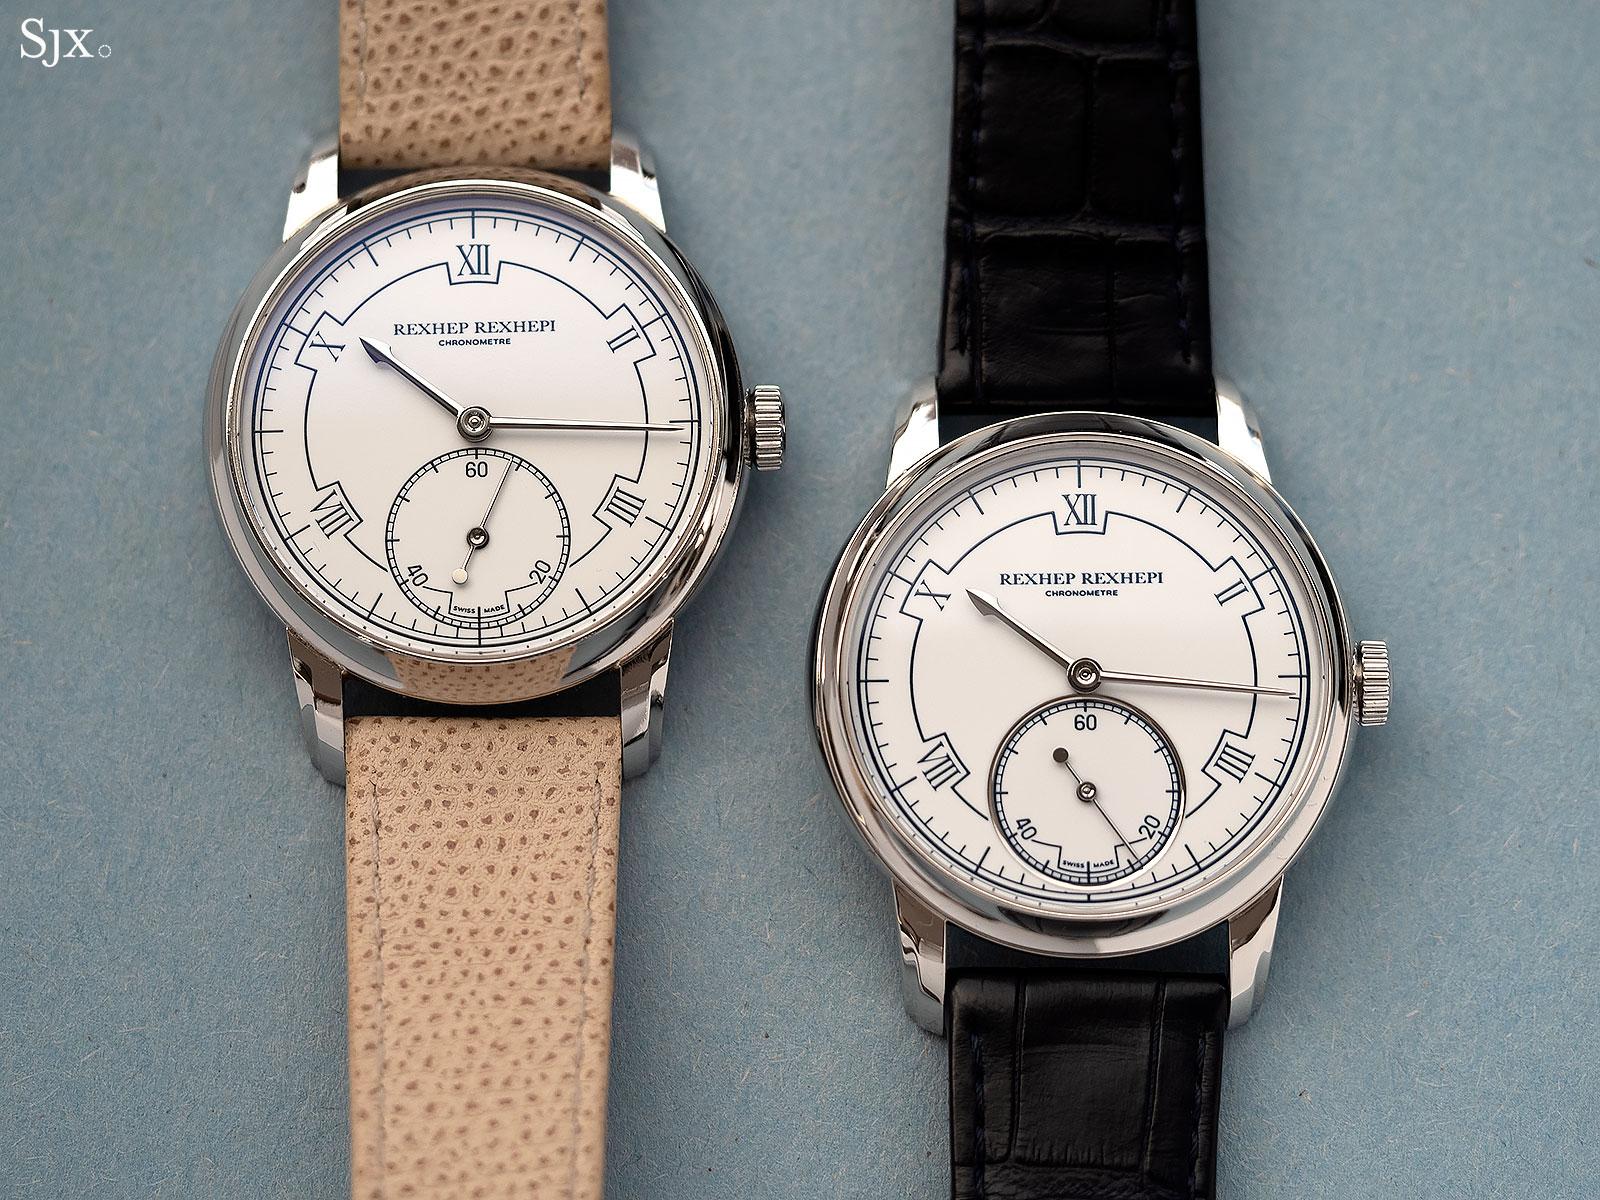 rexhep akrivia chronometre contemporain compare 1